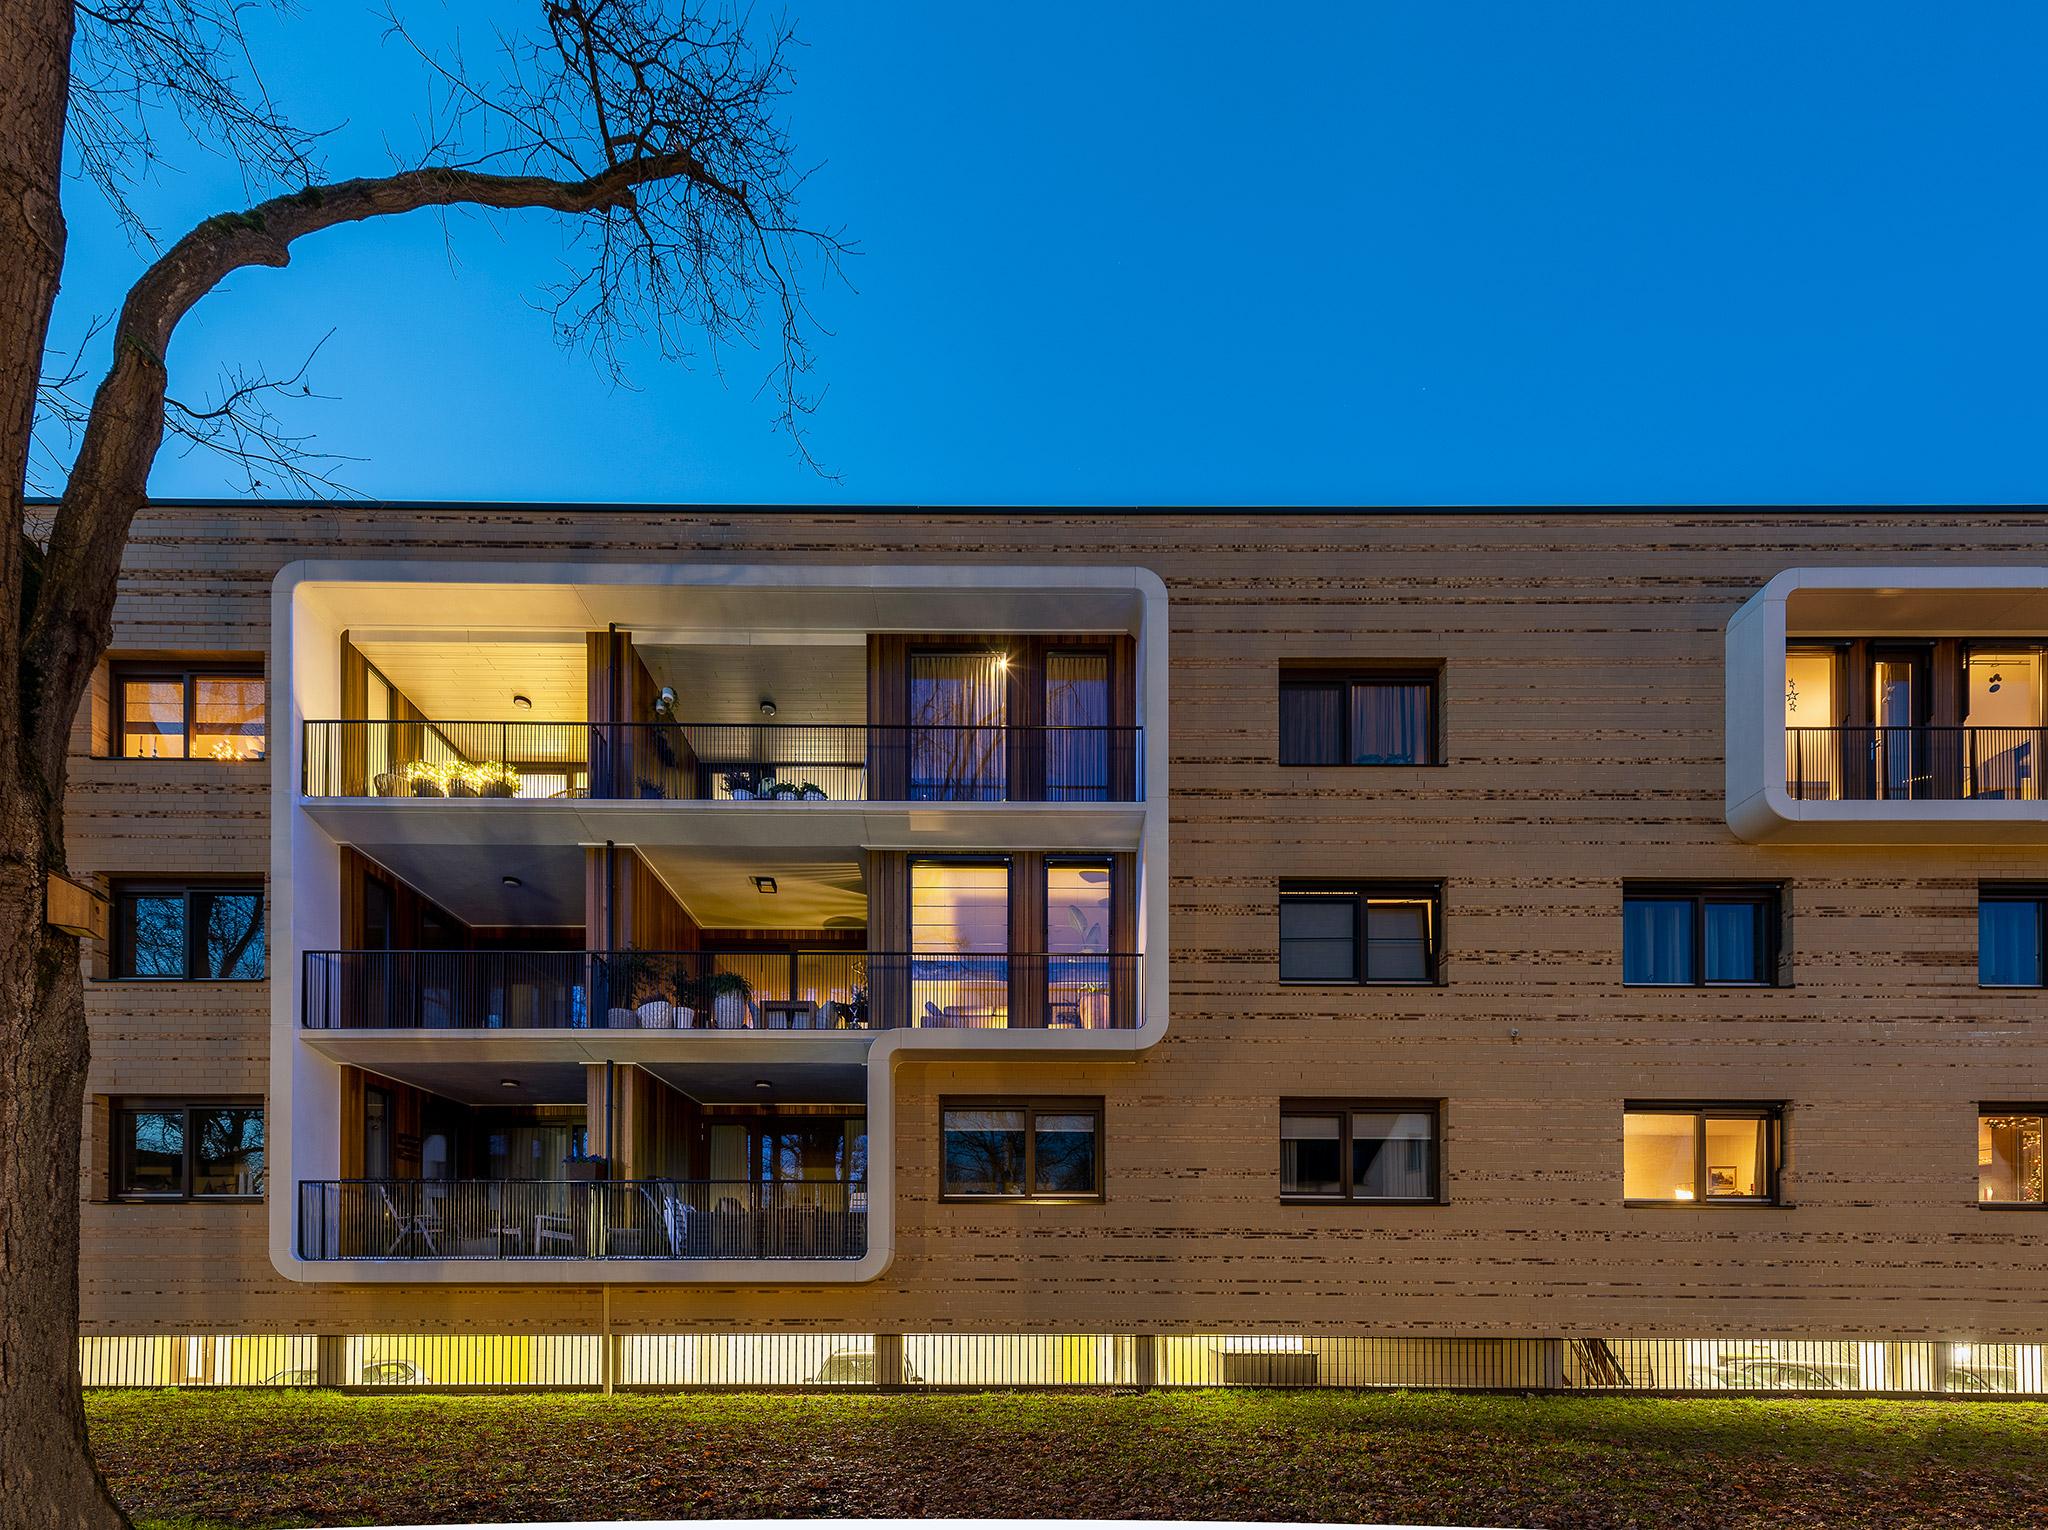 Simone Drost Architecture Planet Pab Architecture Appartementen Stdhouderspark Vught fragment voorgevel bij schemer